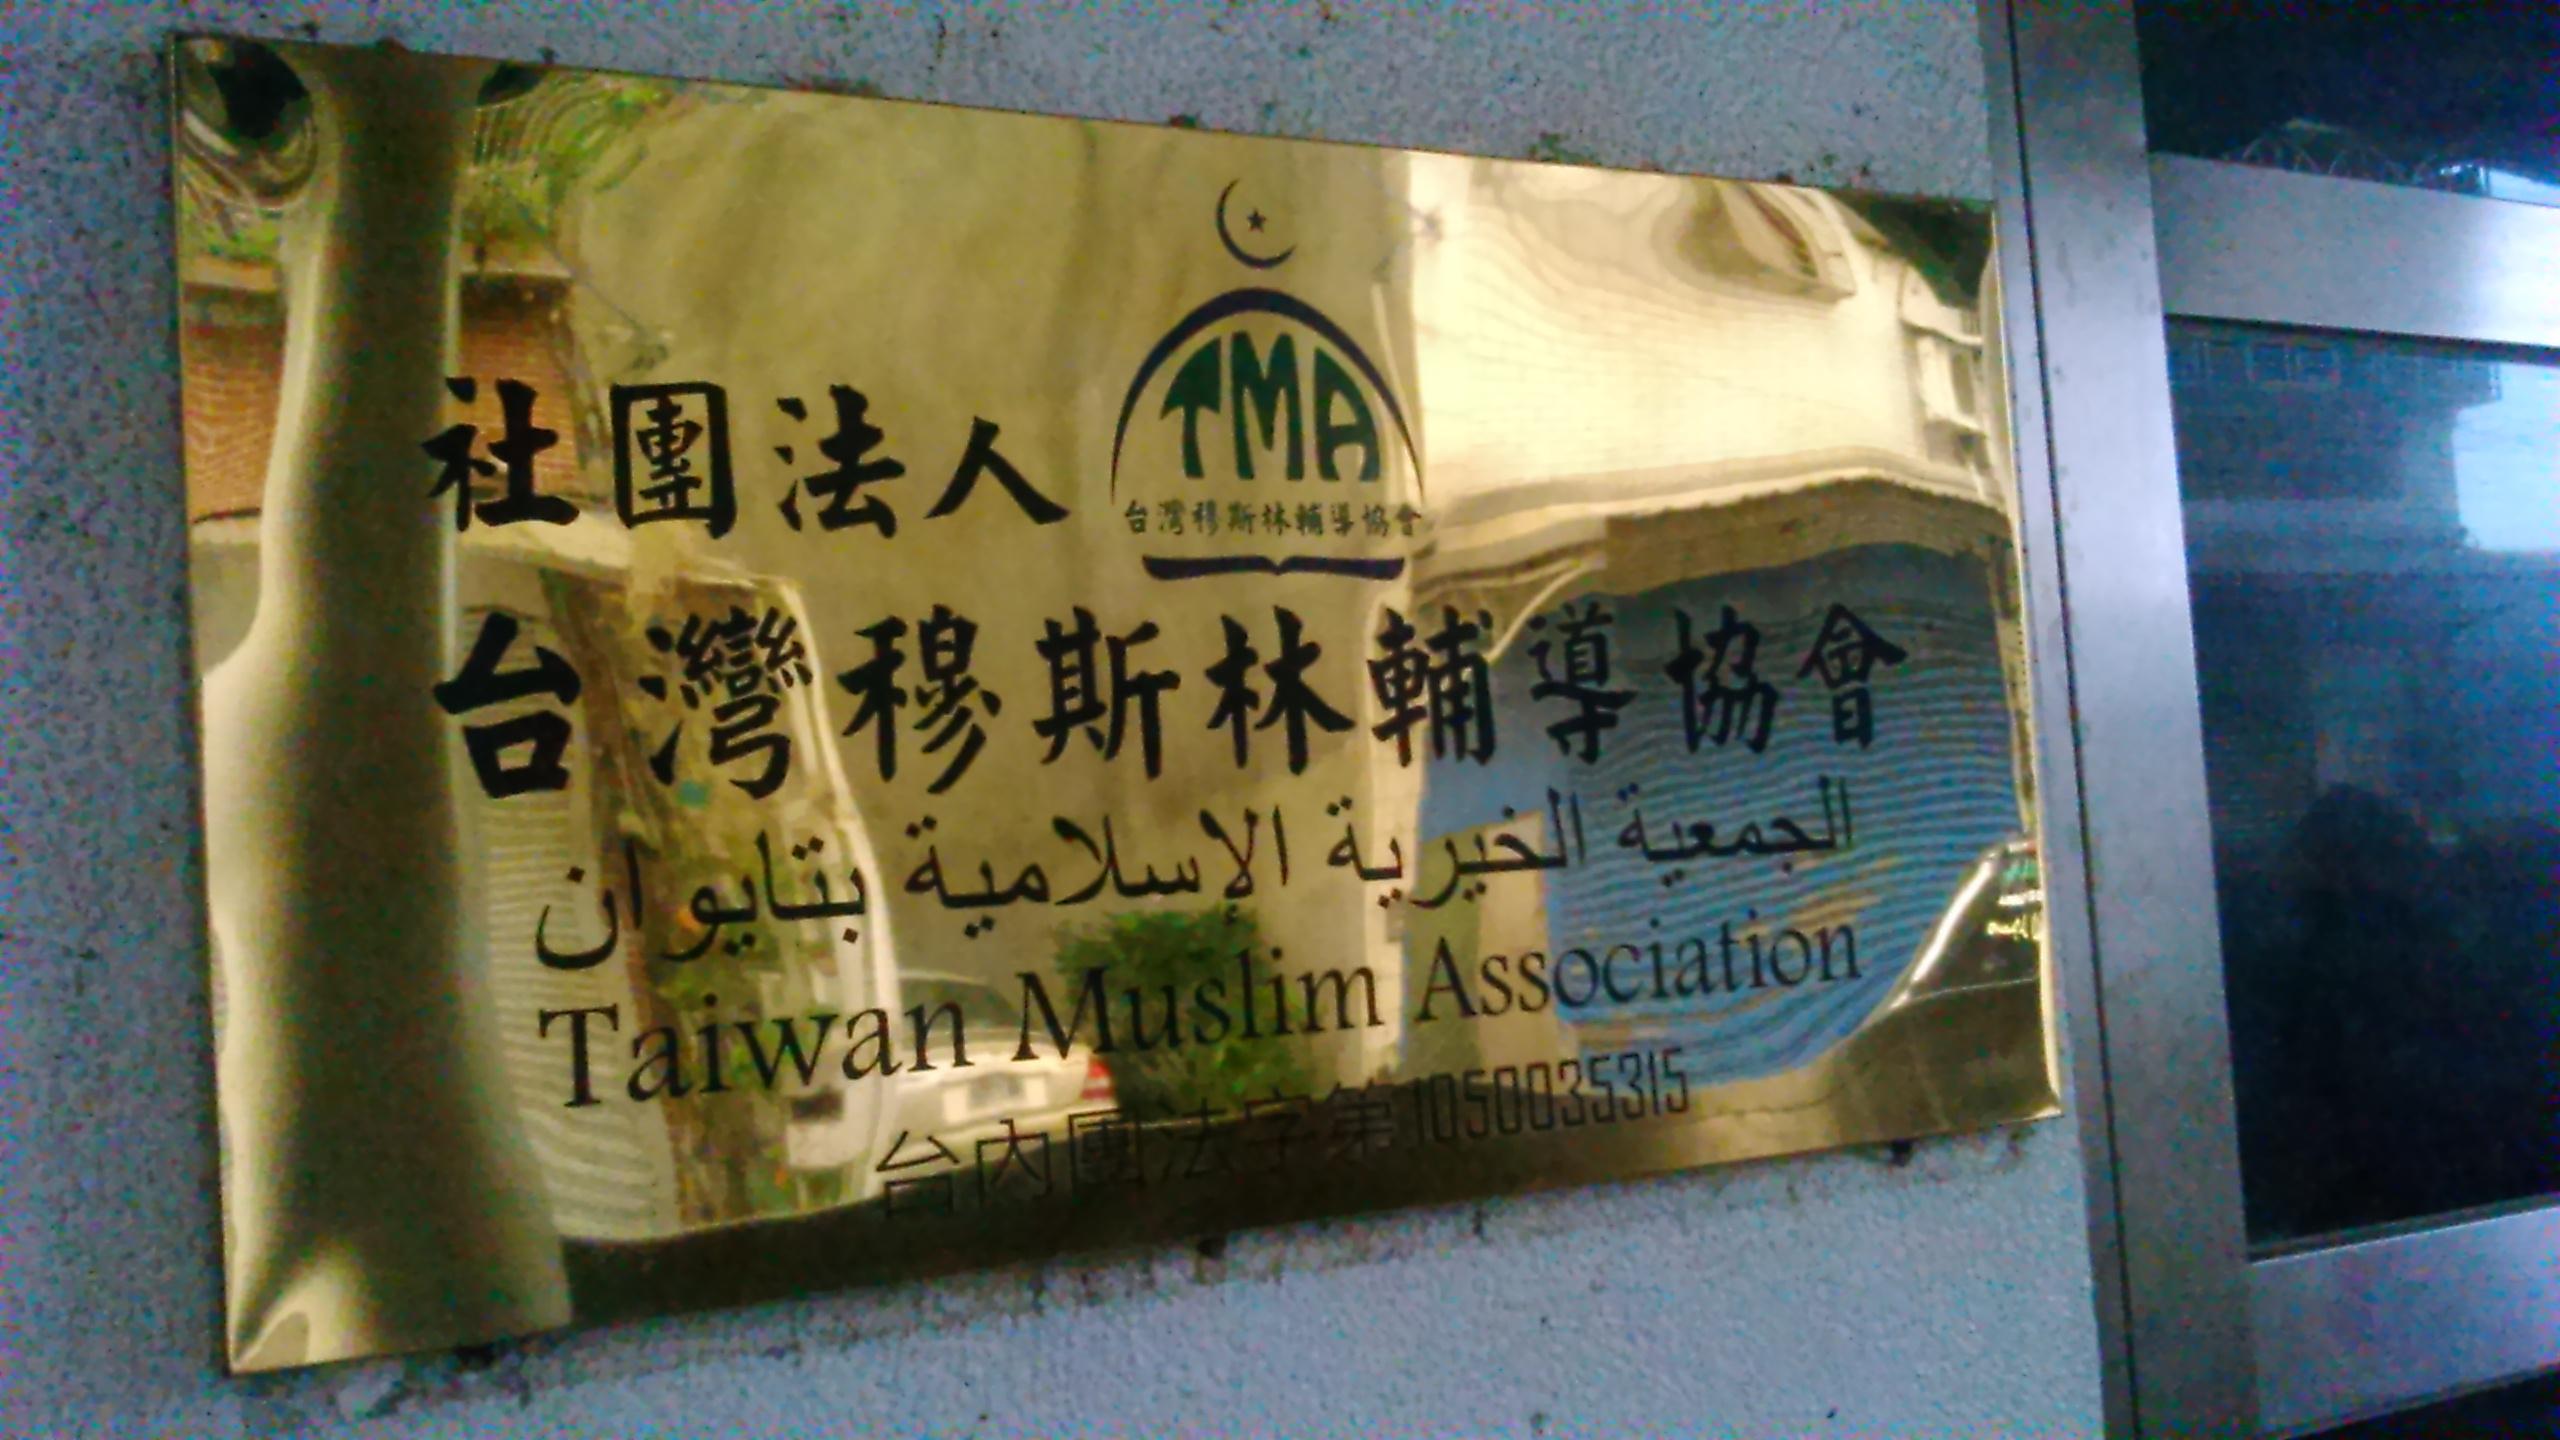 Penanda Taiwan Muslim Association yang menempel di dinding depan masjid At Taqwa, sebagai penunjuk bahwa masjid At Taqwa dinaungi secara resmi oleh satu lembaga yang diakui di Taiwan